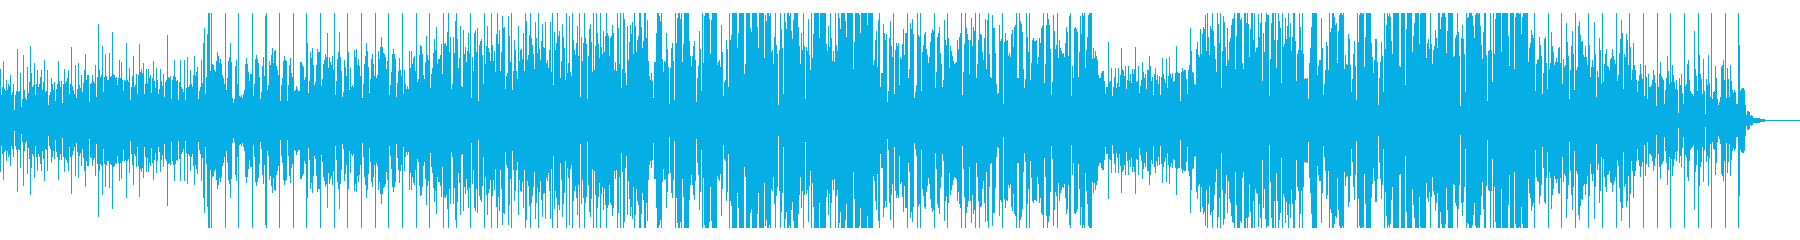 ZEDD Chainsmokers風 の再生済みの波形